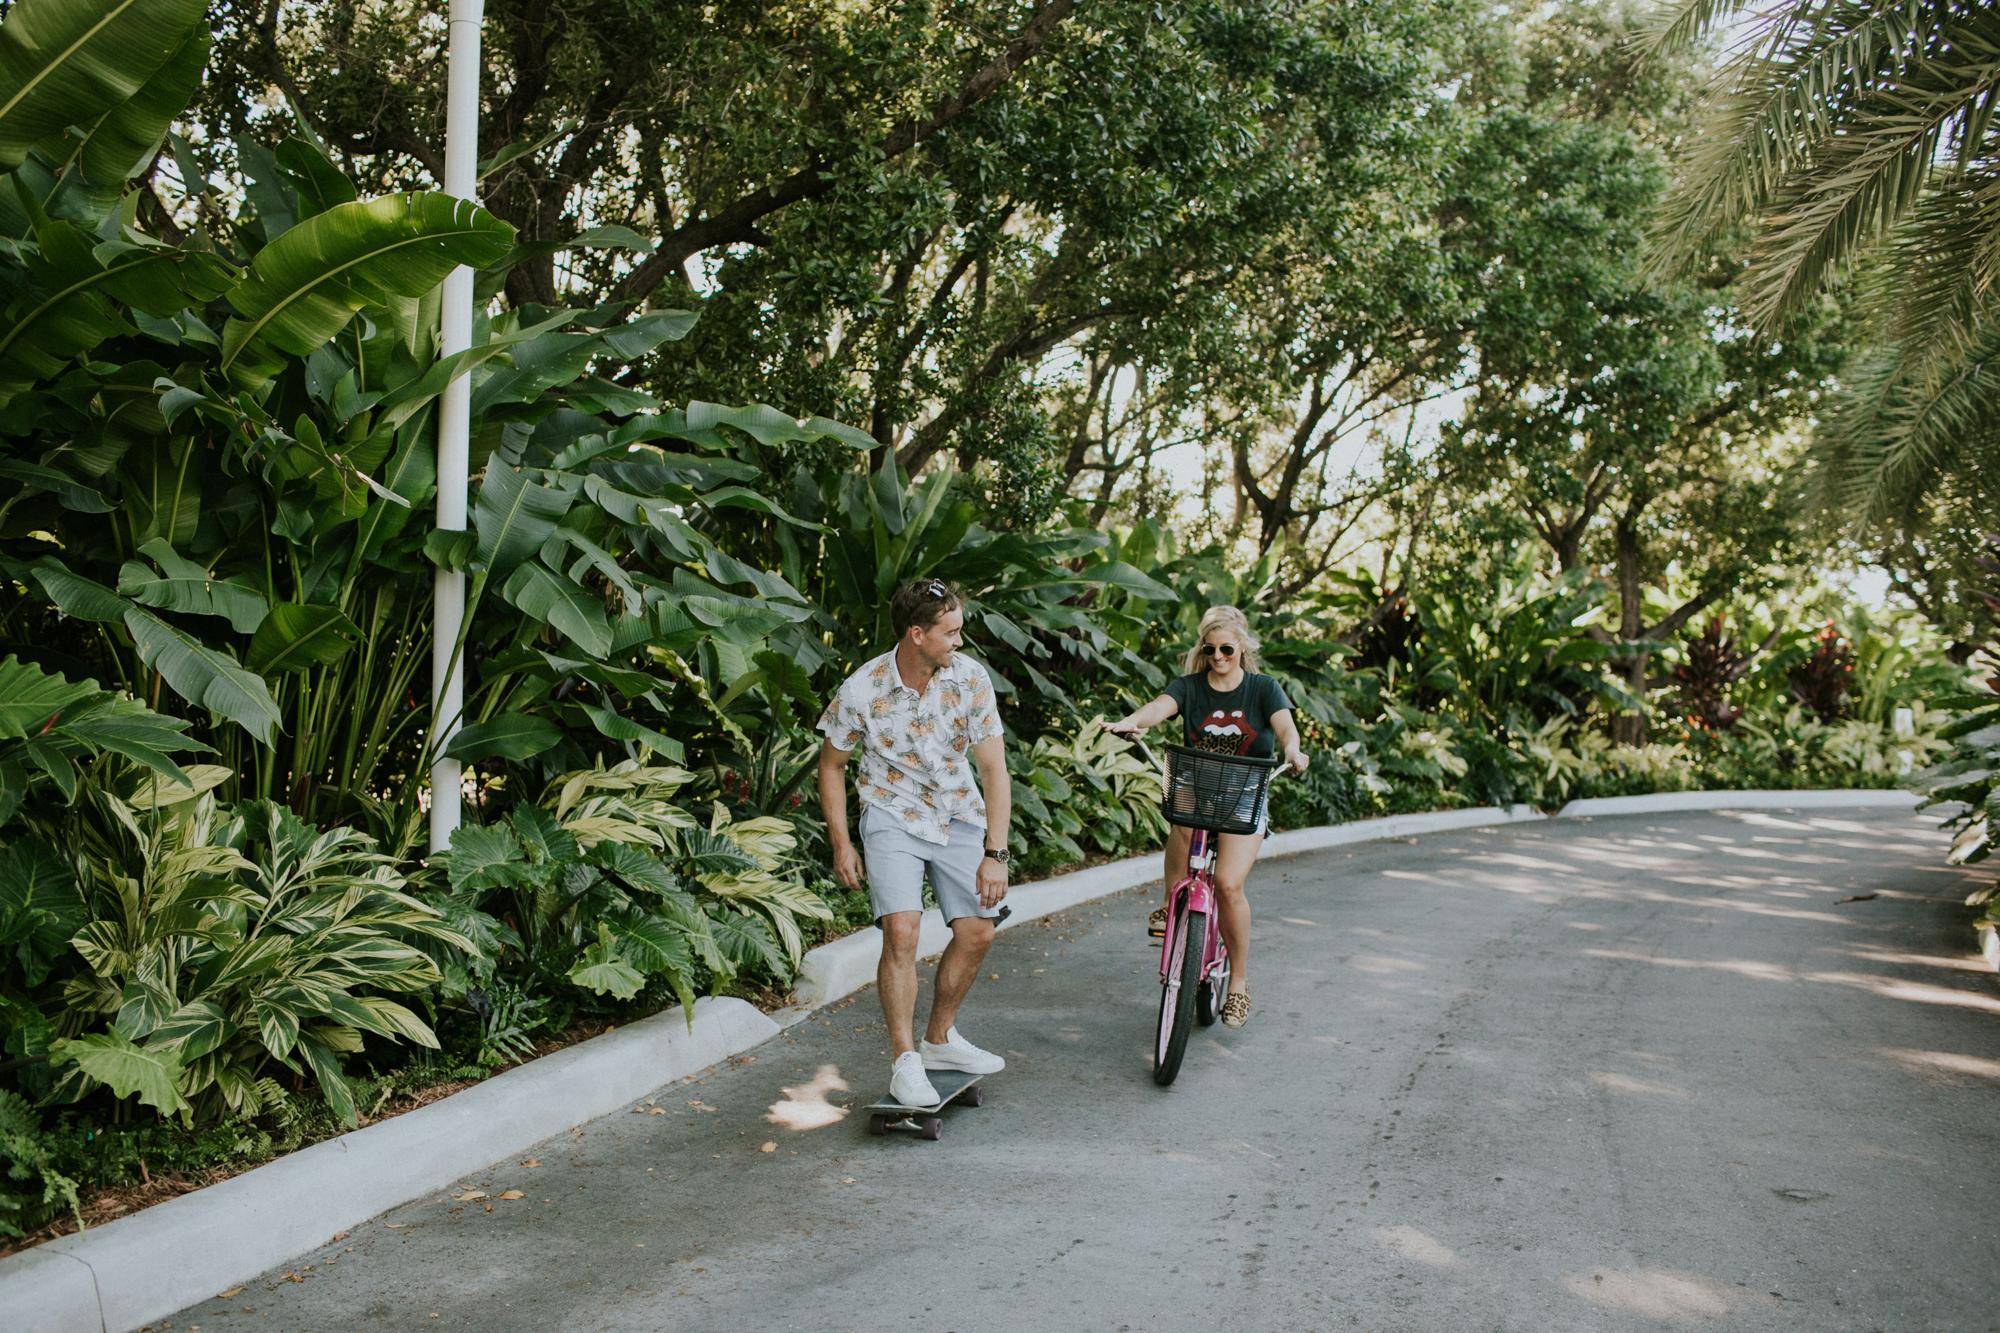 Riding bikes at the Islander Resort Islamorada